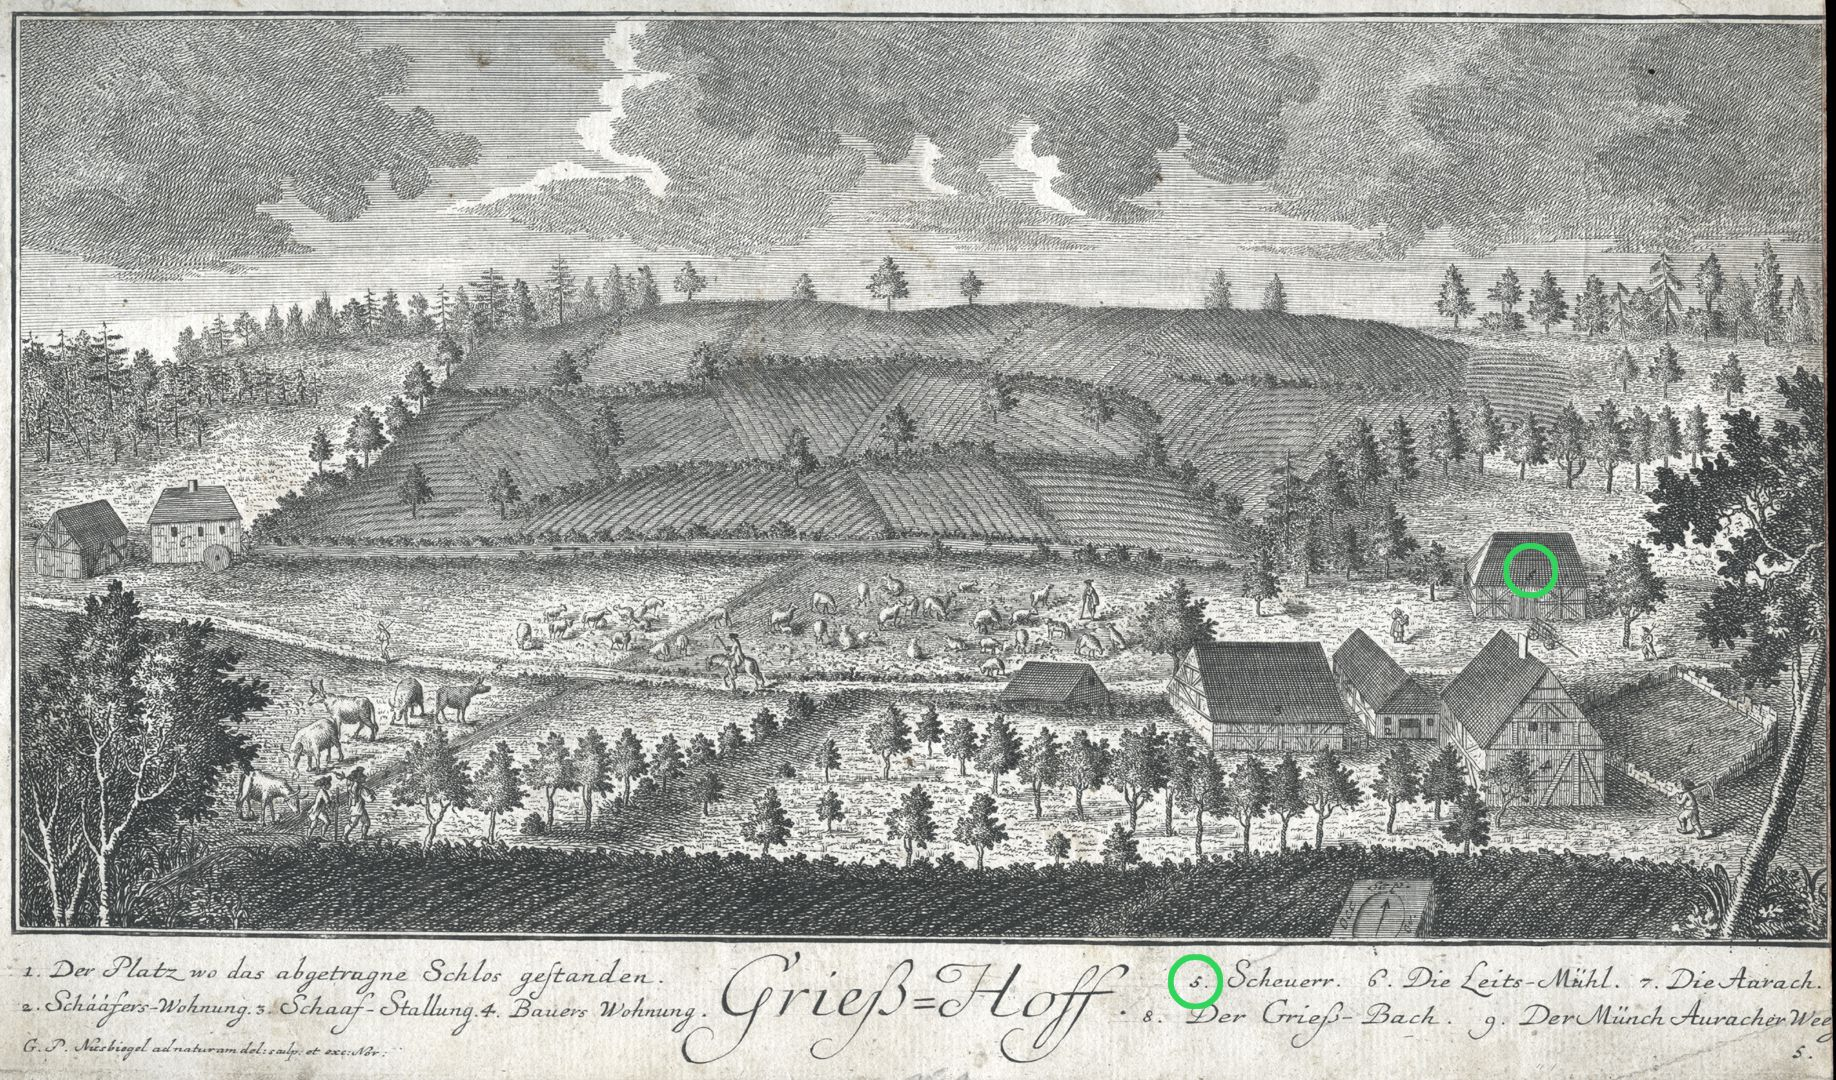 Grieß=Hoff  (Griess farm) Barn